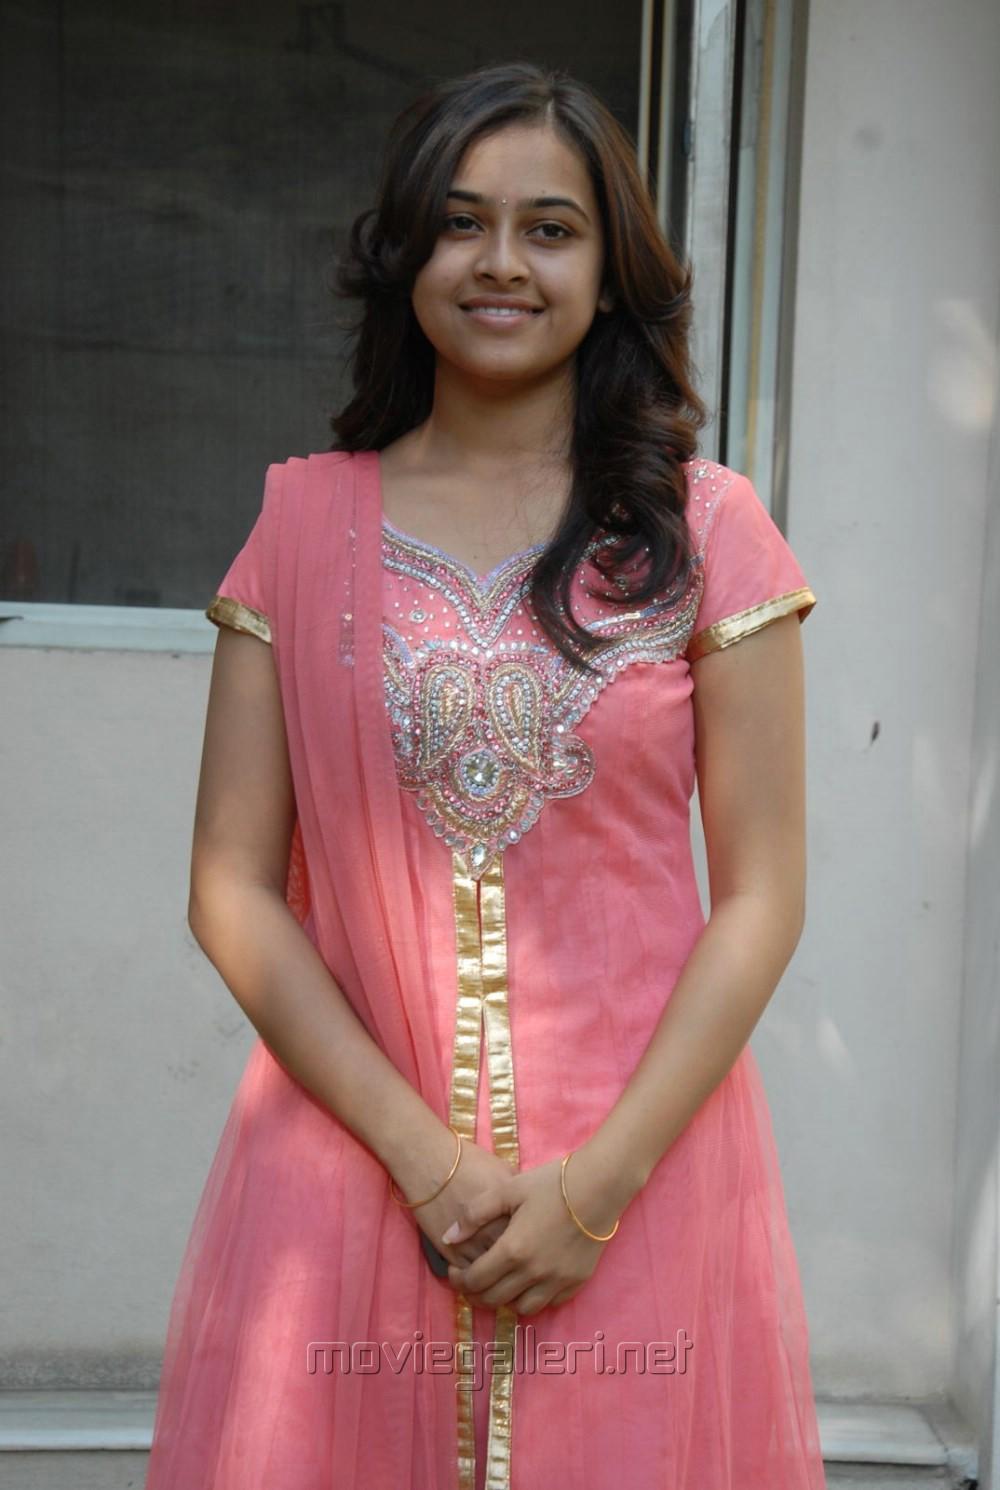 desi indian hot girls radha s indian ethnicity indian hot designer